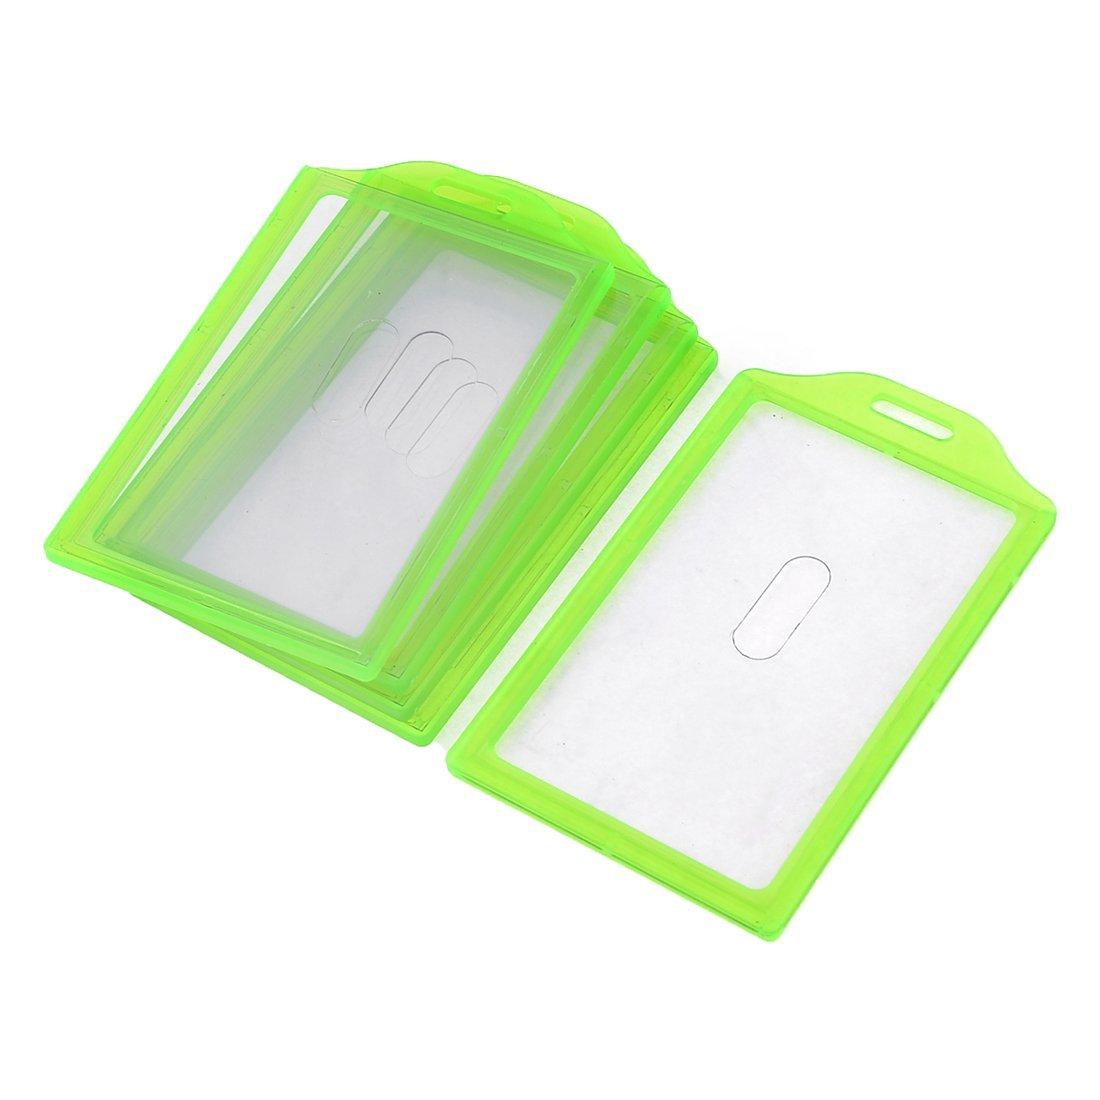 Uxcell Plastic Frame School Slide ID Card Holder, 84 x 52 mm, 5-Piece, Green